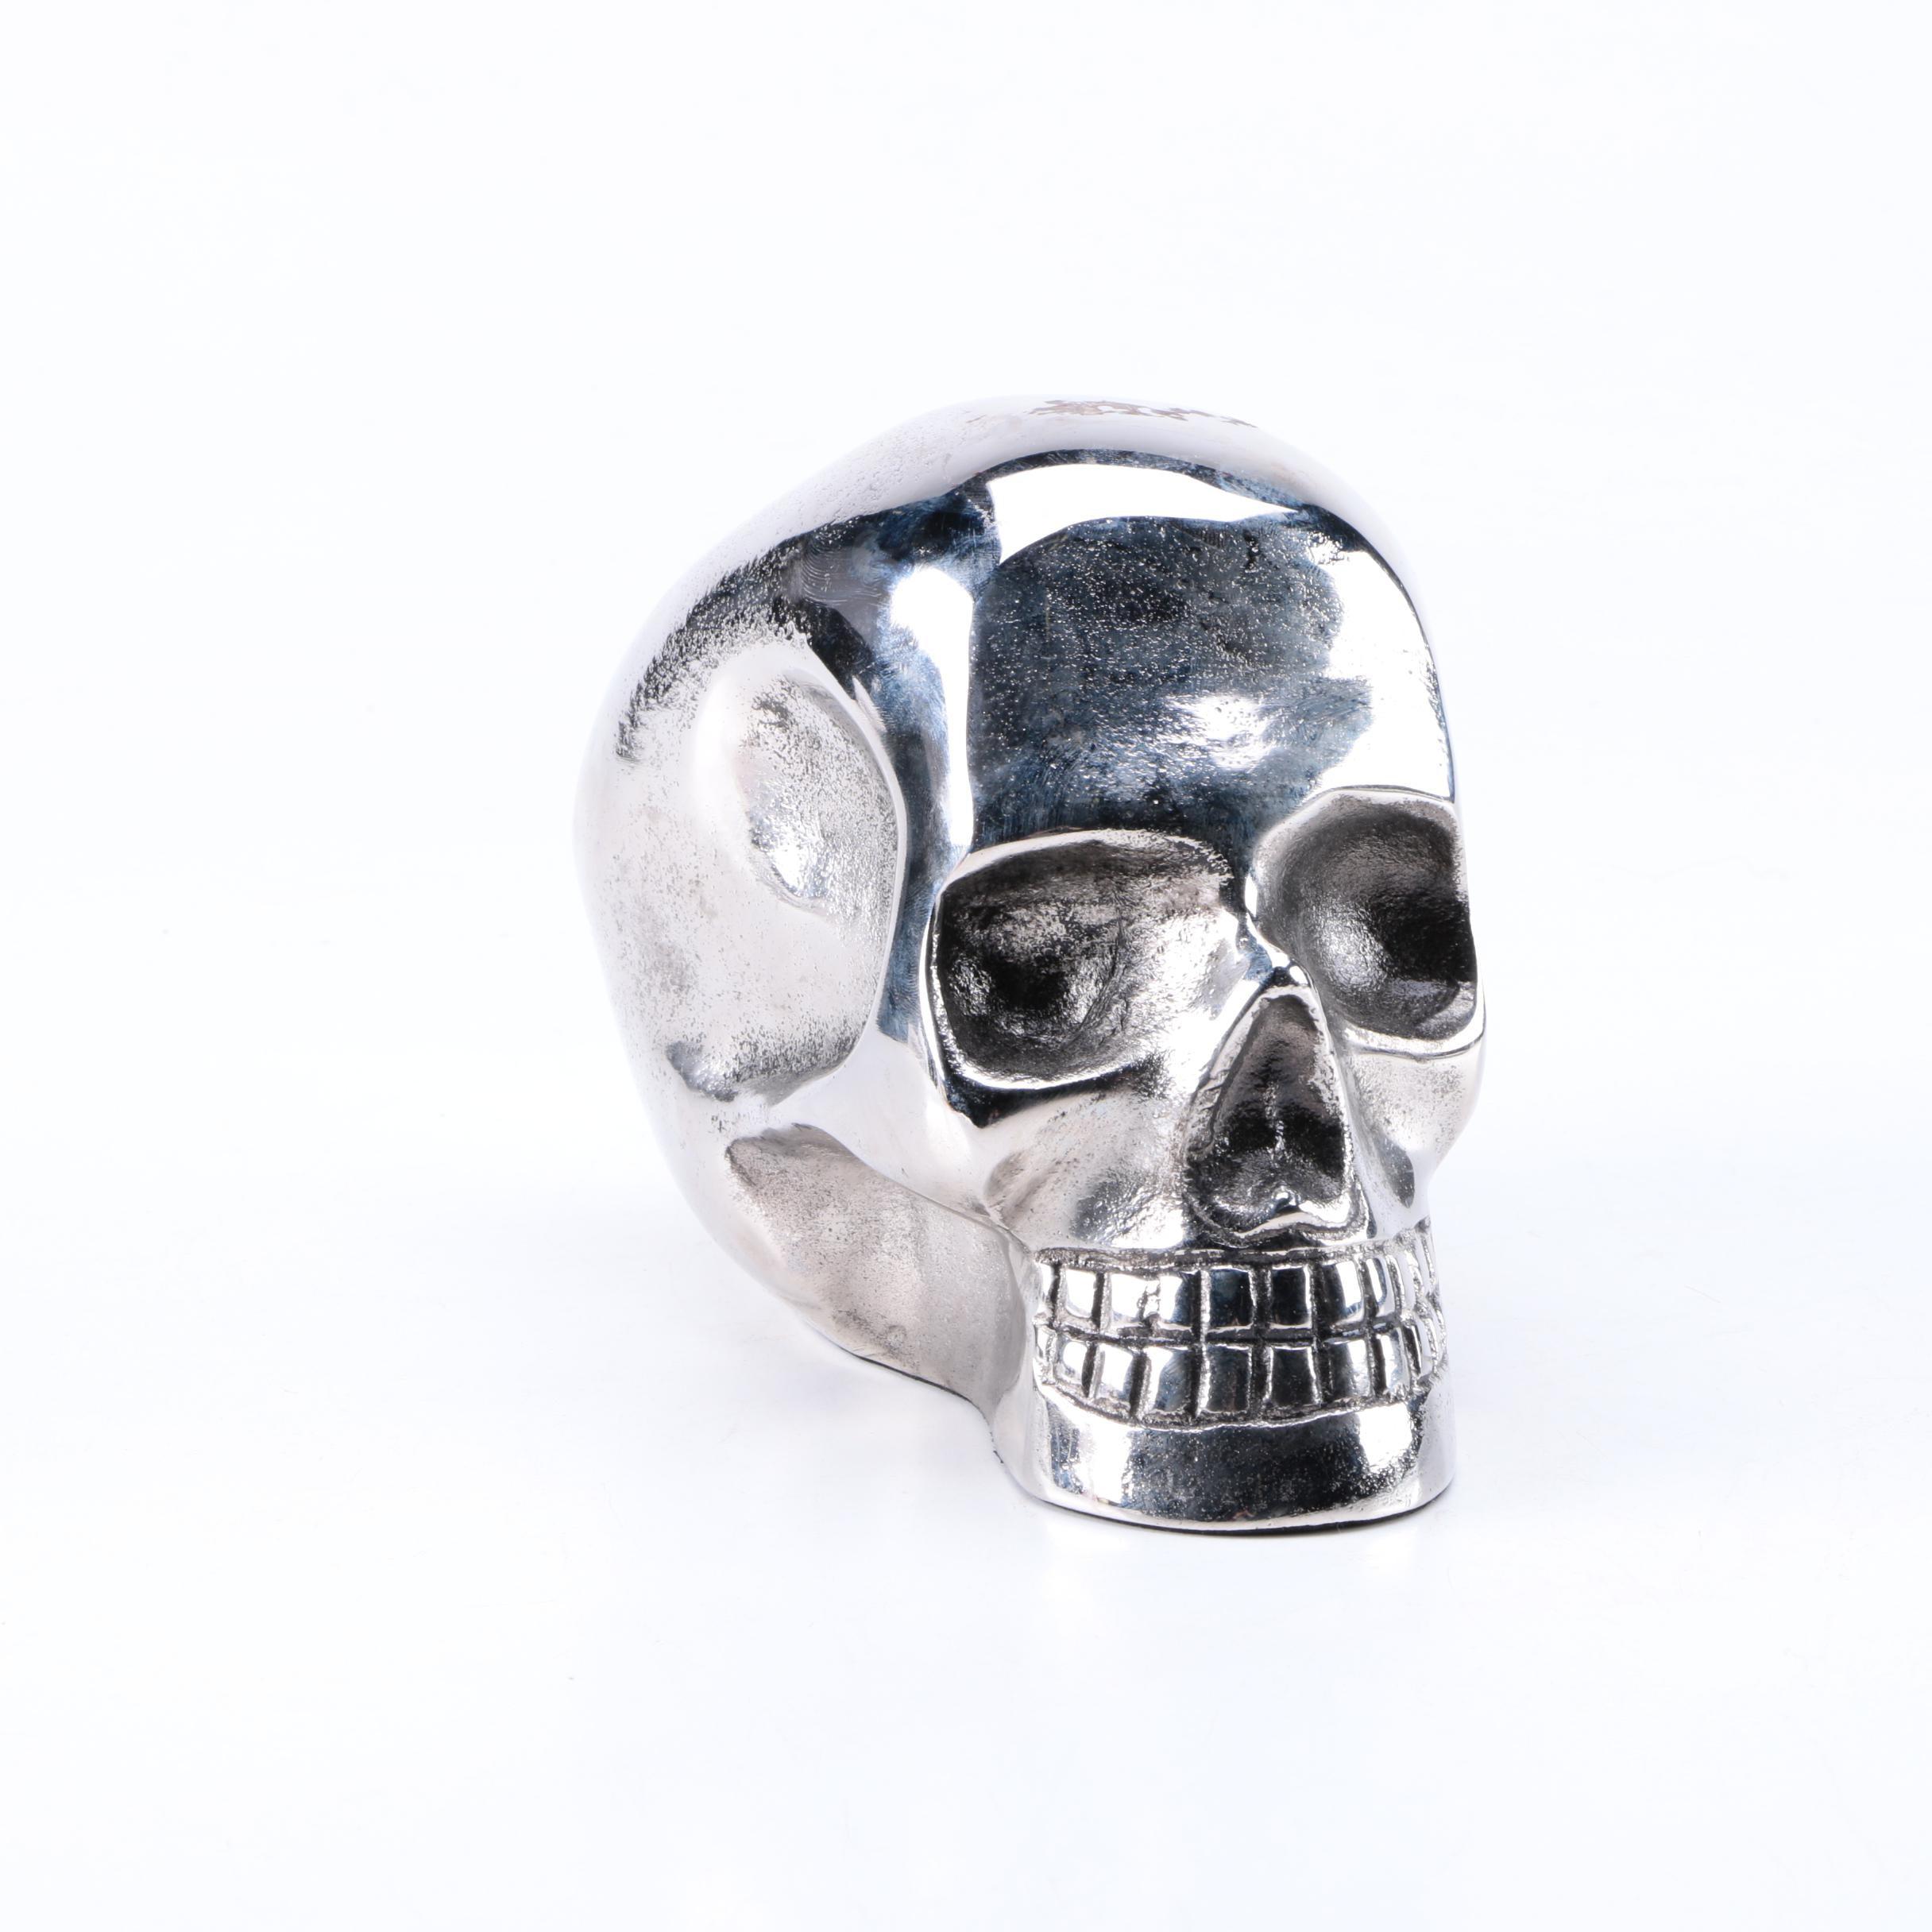 Silver Tone Metal Skull Figurine